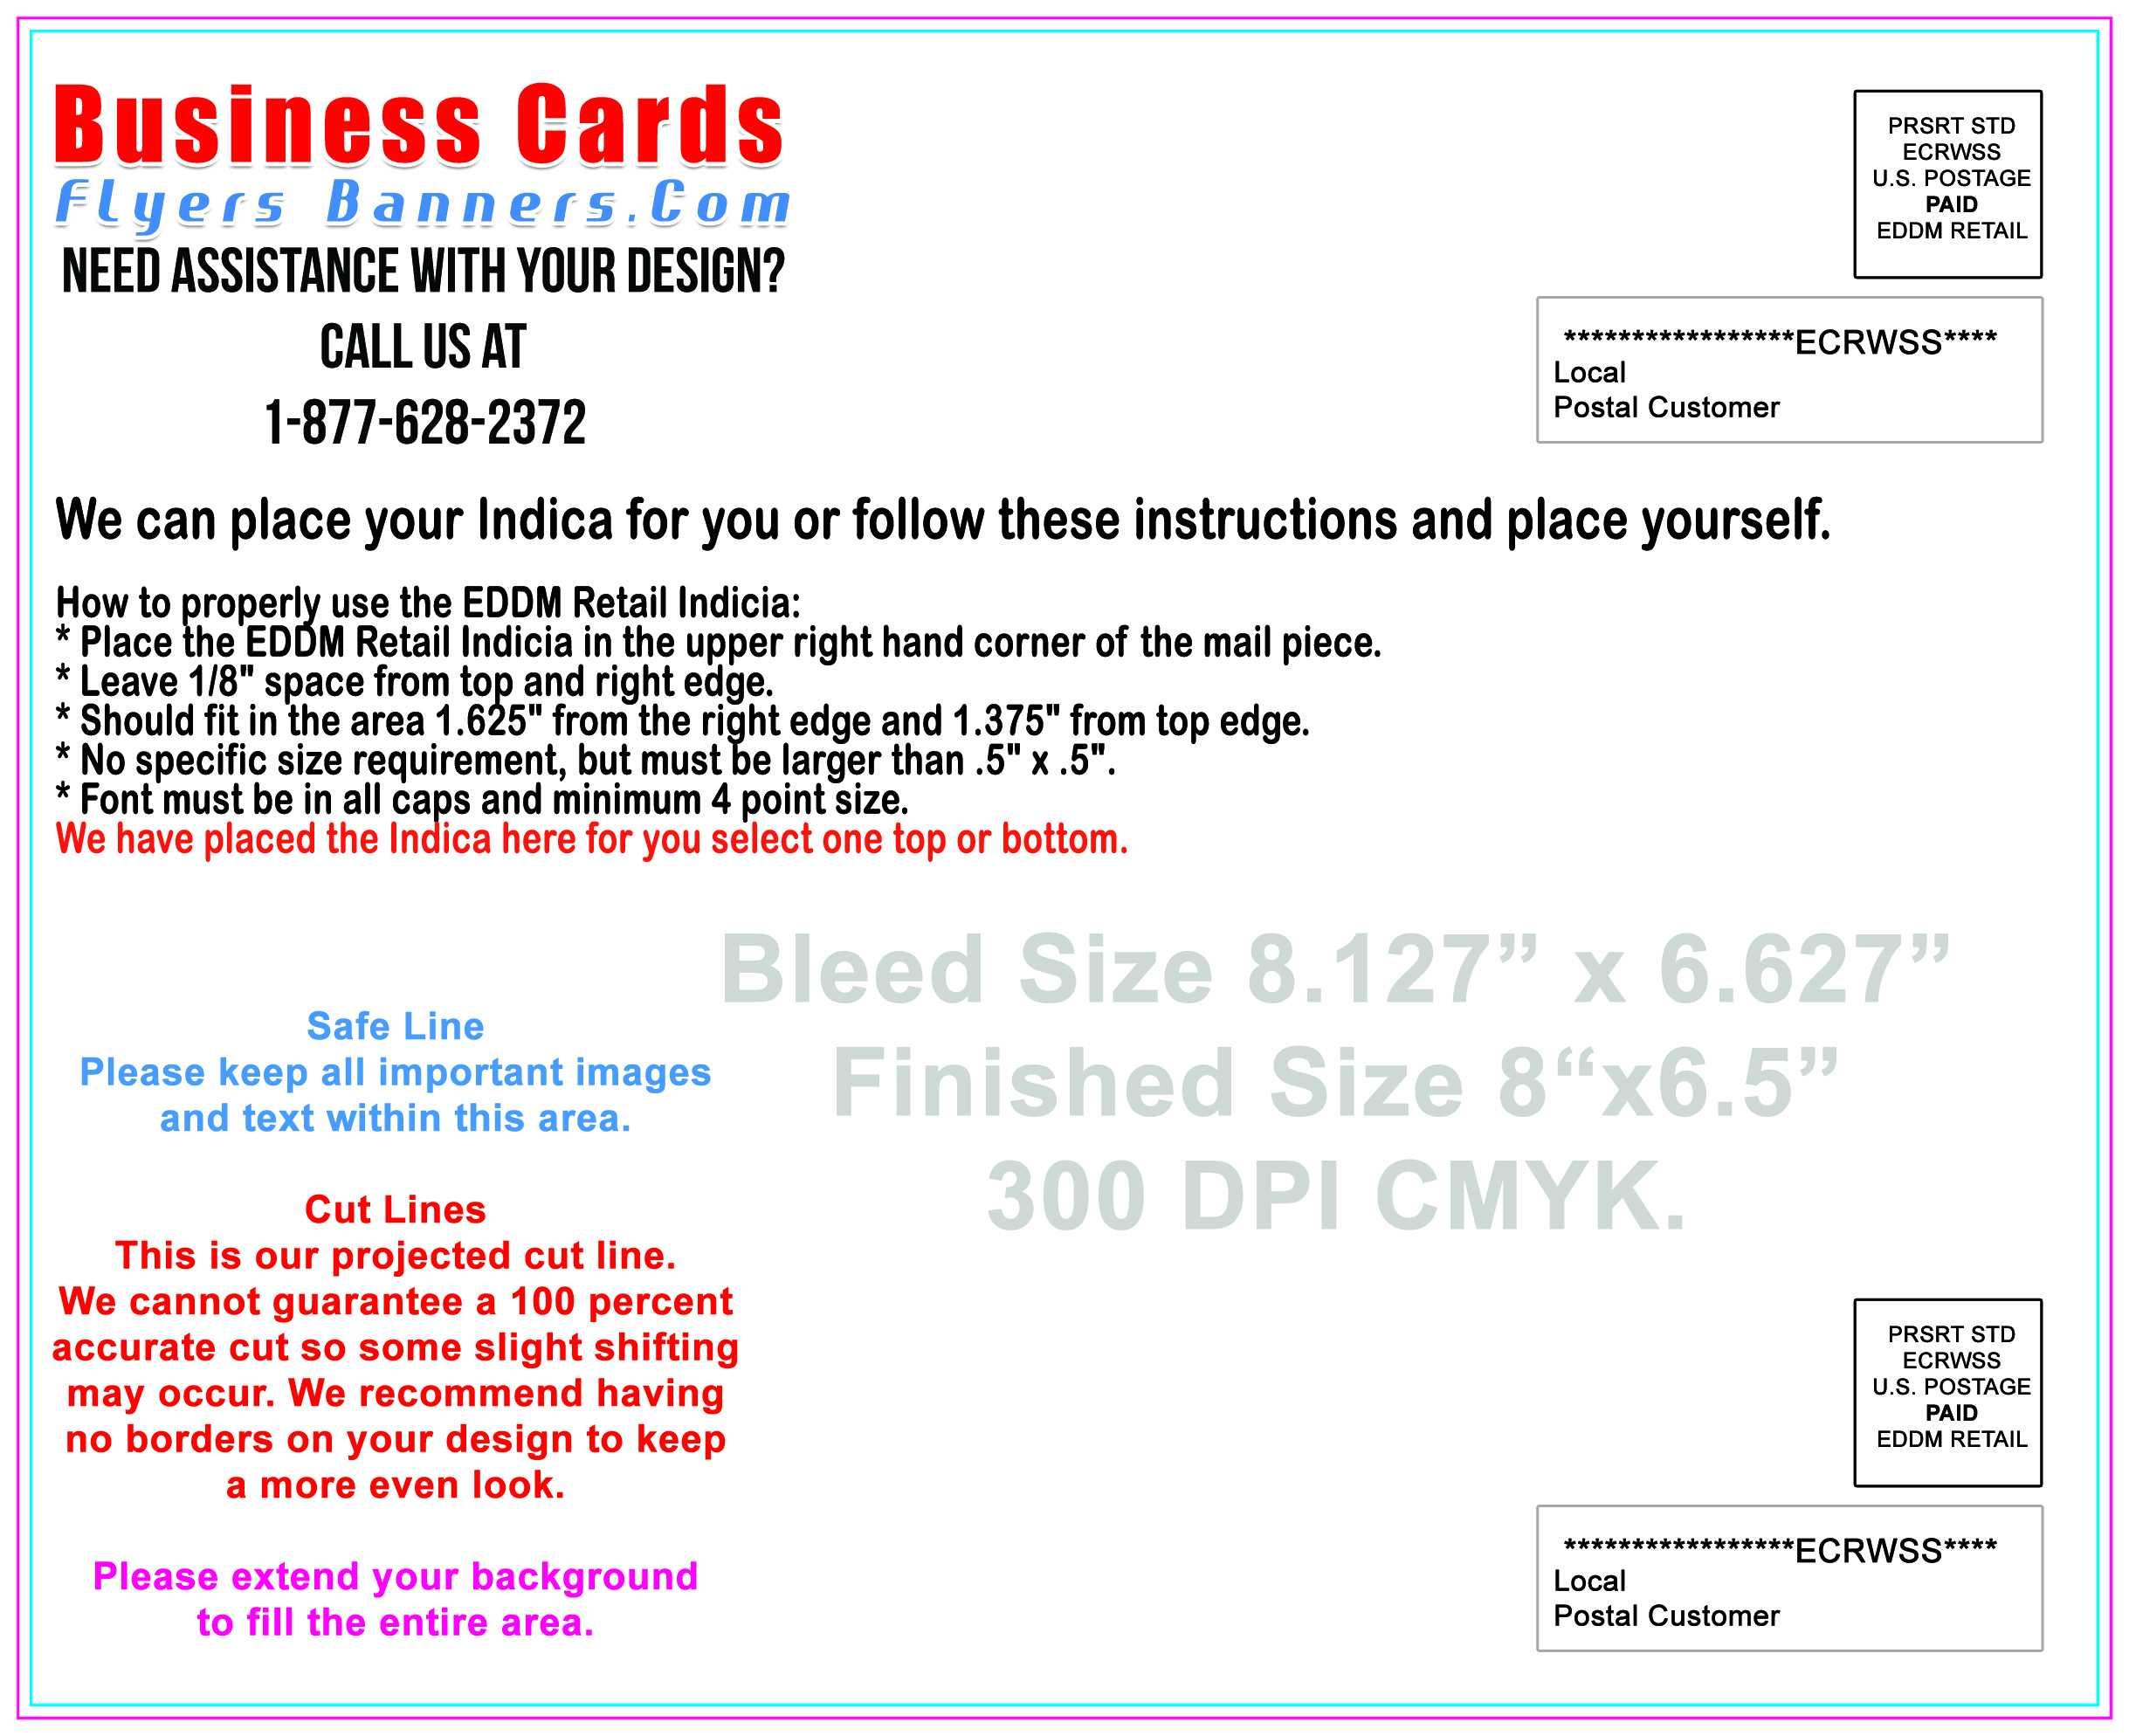 Eddm Postcard Templates - Eddmdiscounts Pertaining To Every Door Direct Mail Template